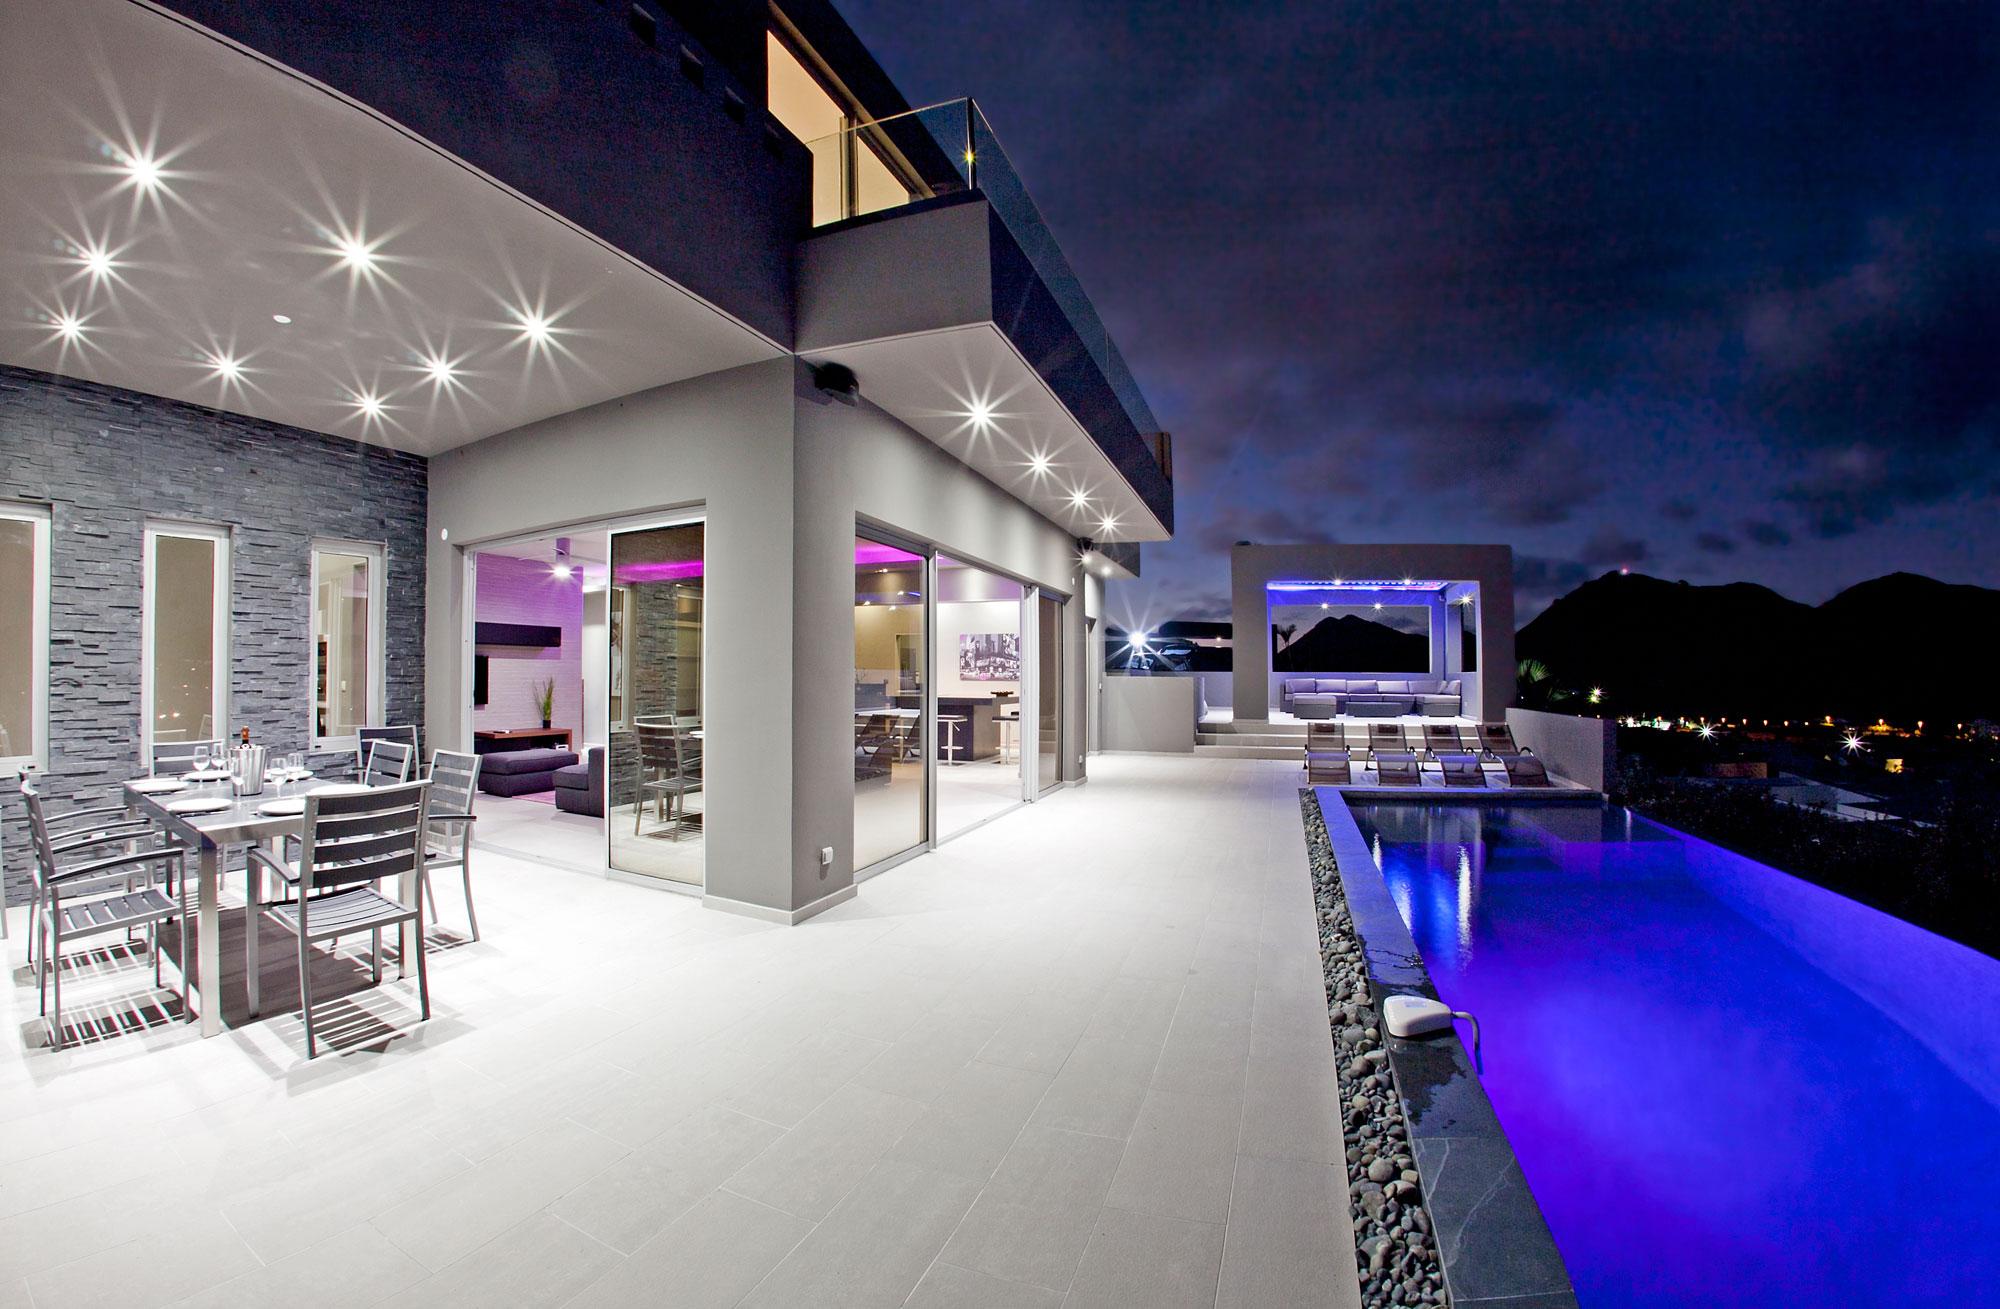 emvie villa - for sale in st. martin | mac caribbean villas